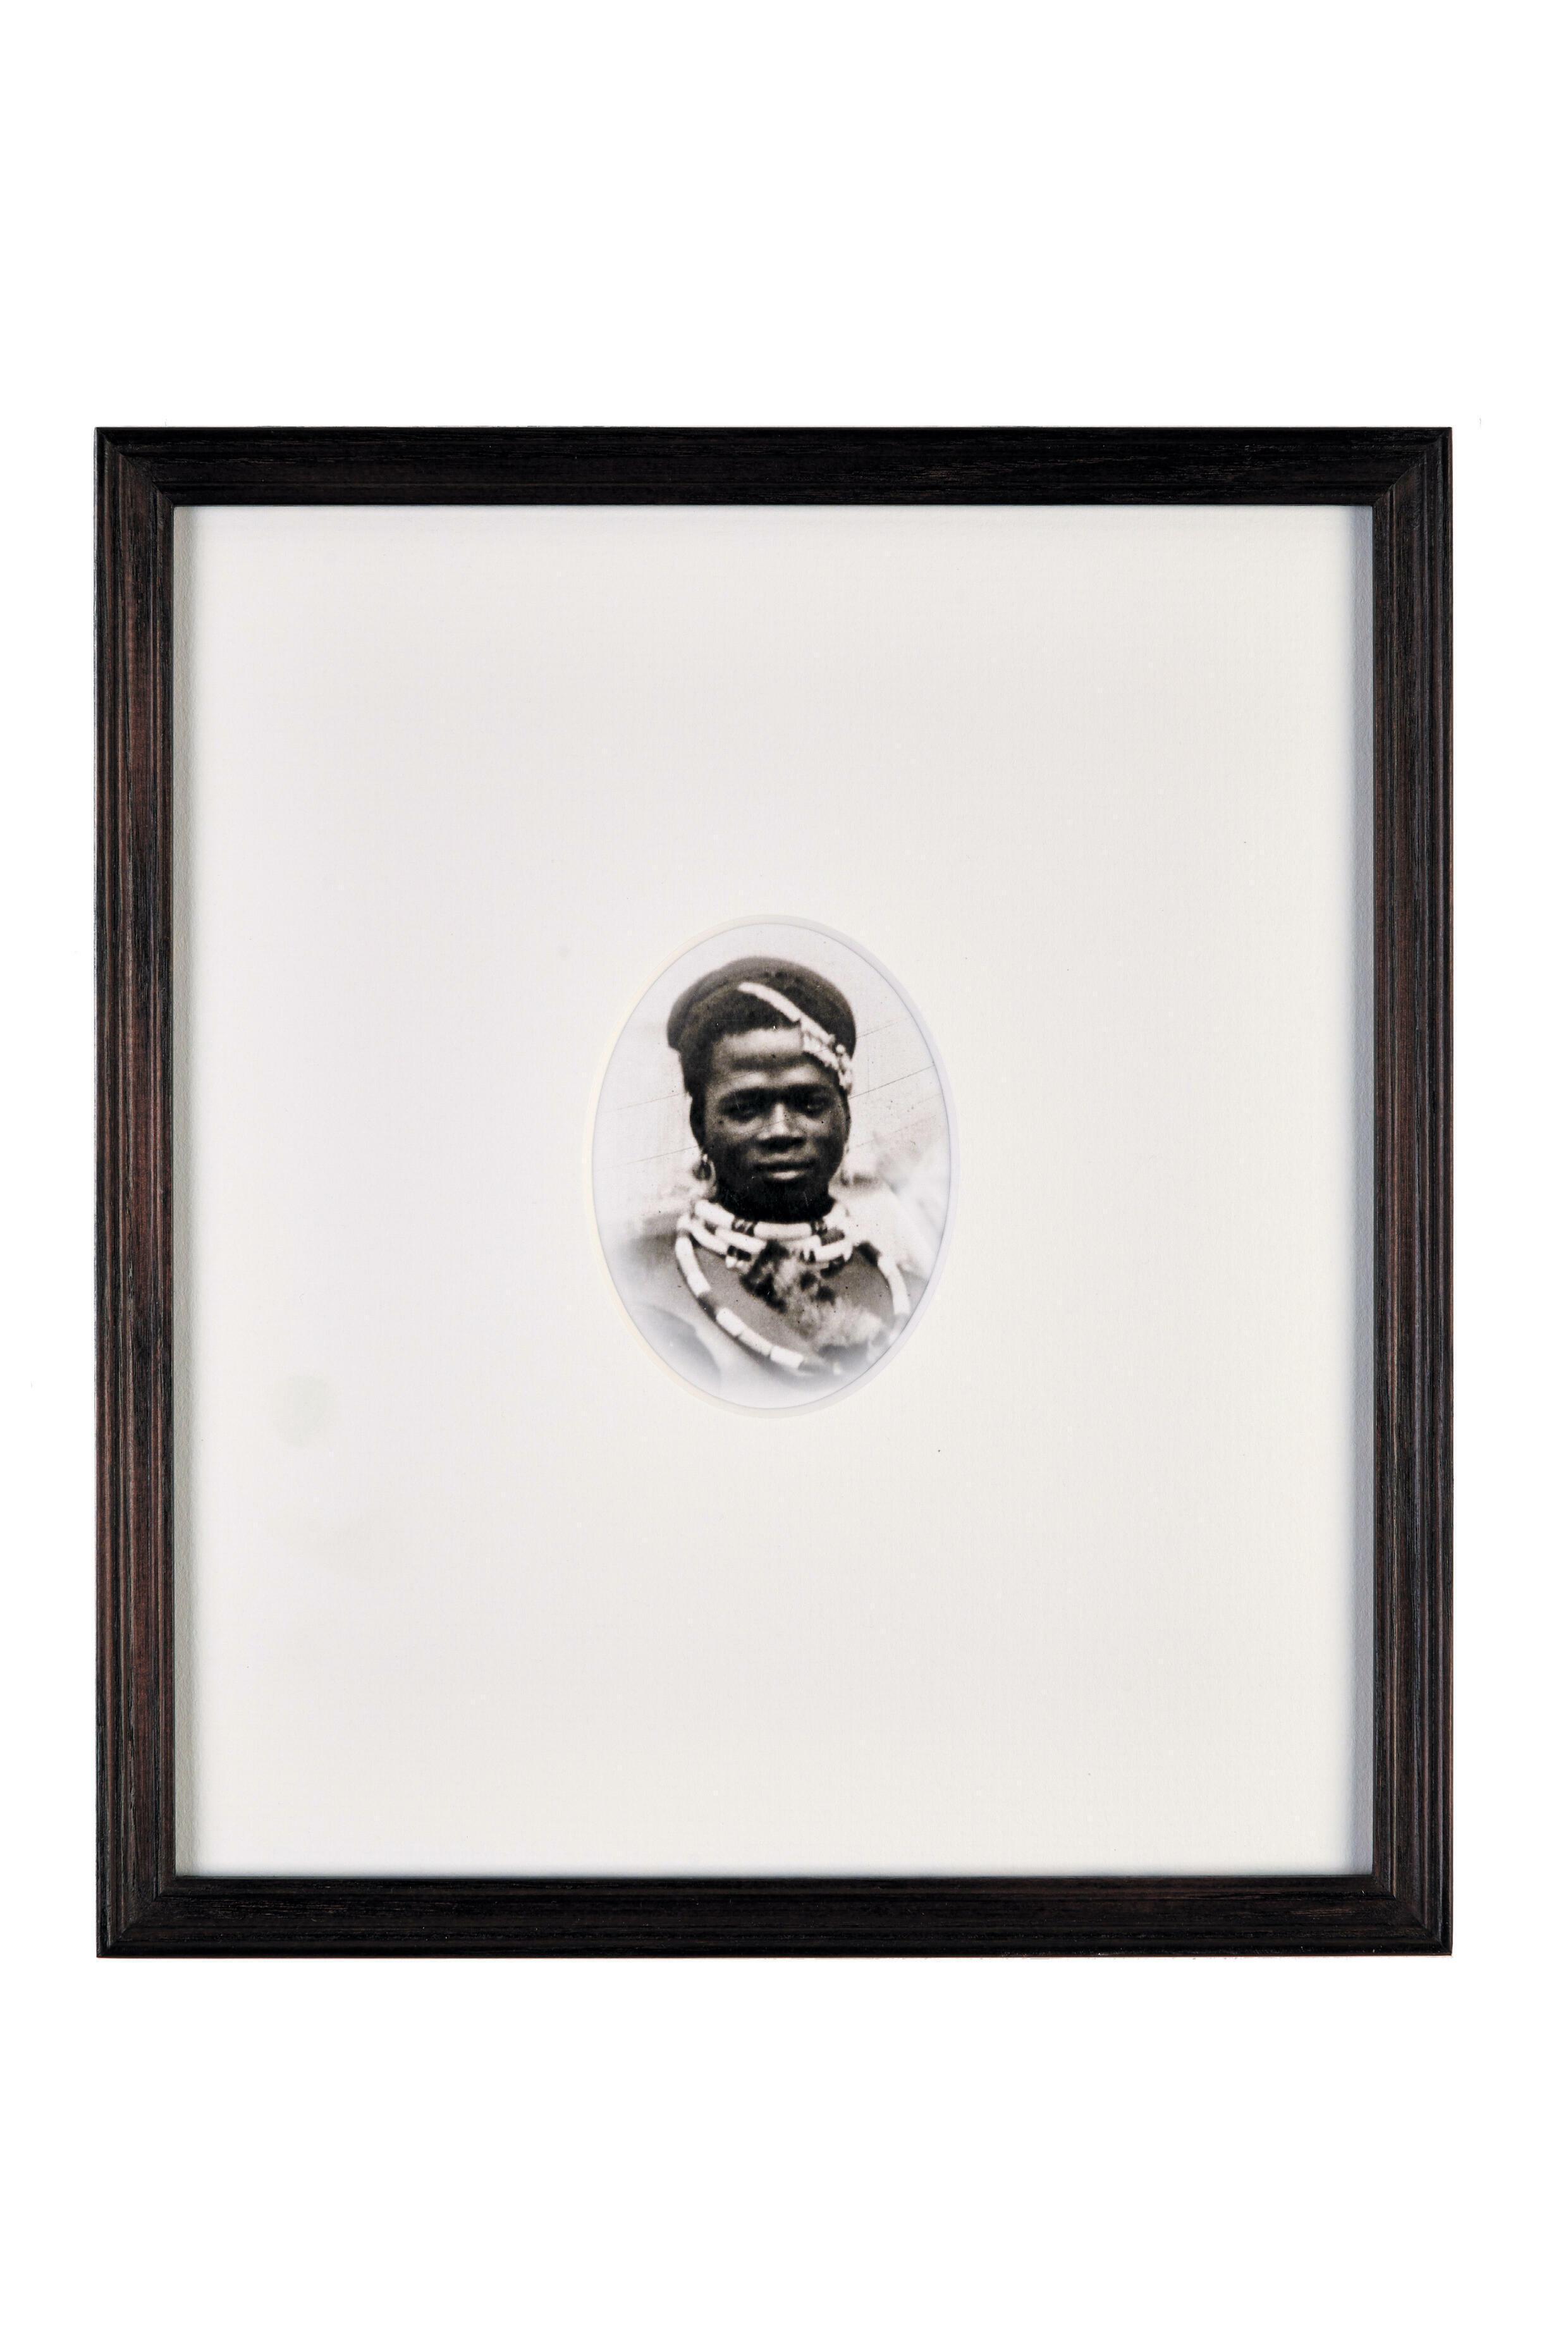 Faces, installation by Nadia Kaabi-Linke, a series of 32 archive photographs (2014), presented as part of the Un.e Air.e de Famille exhibition, Paul Eluard Museum, Saint-Denis